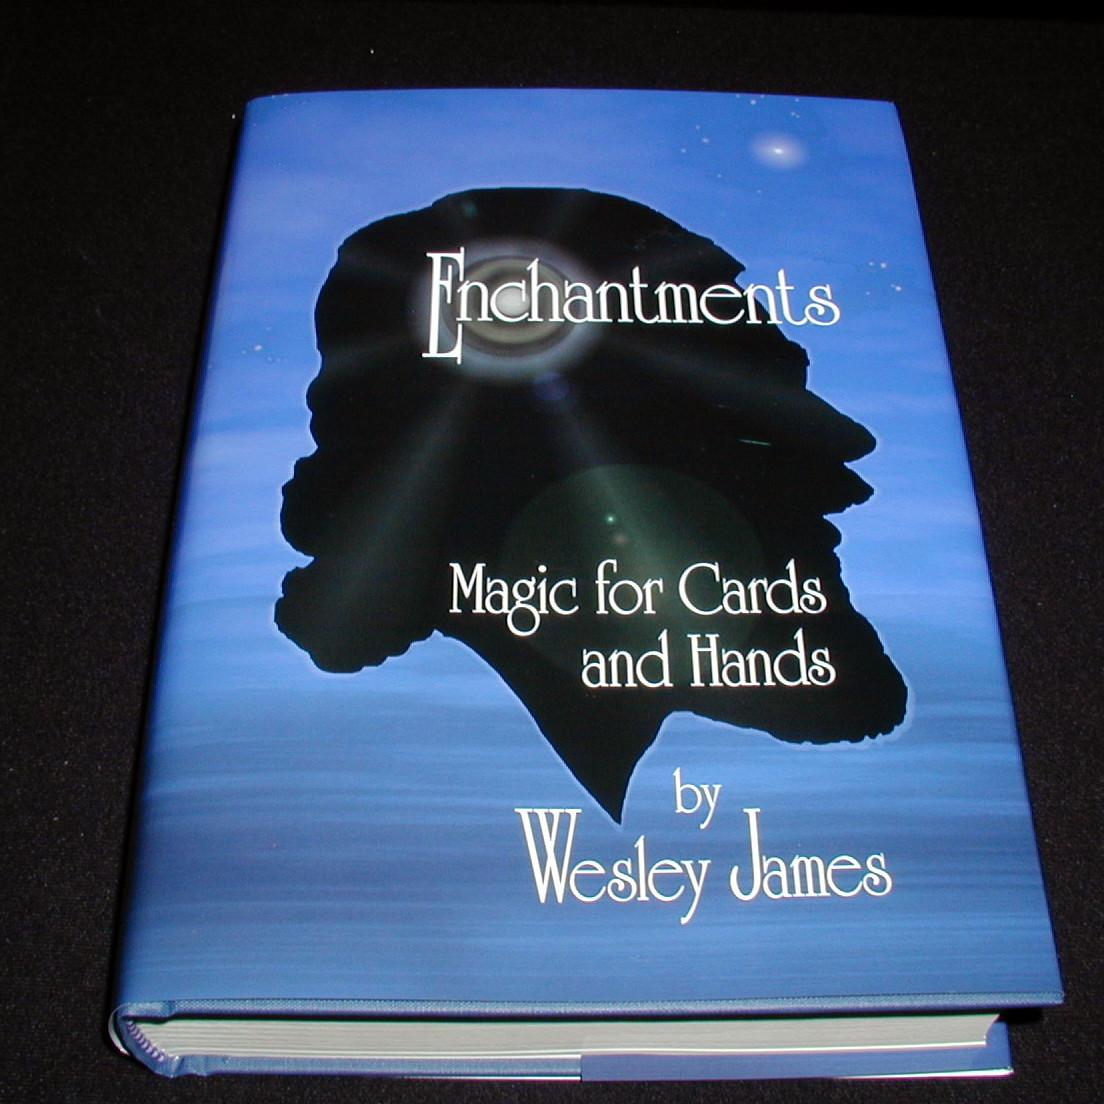 Image result for Wesley James Enchantments